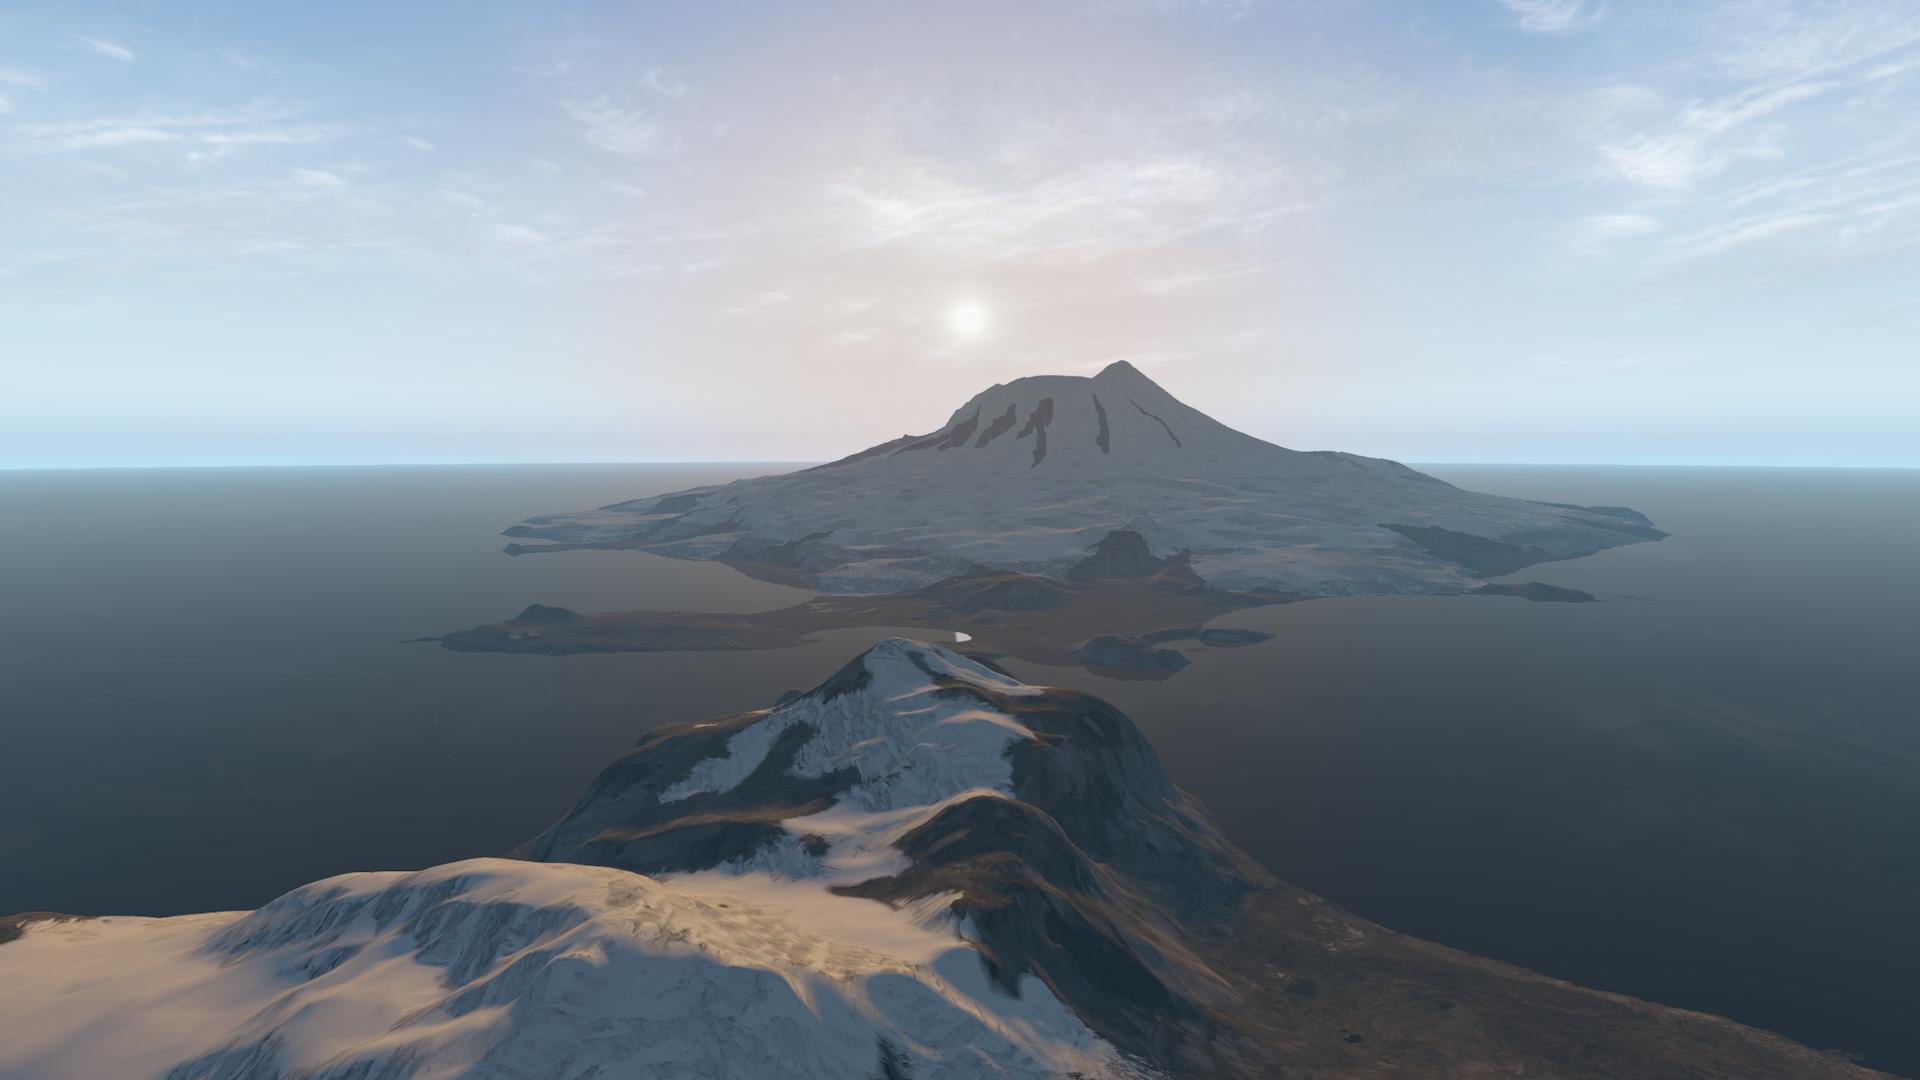 MCDONALD MCDONALD ISLAND